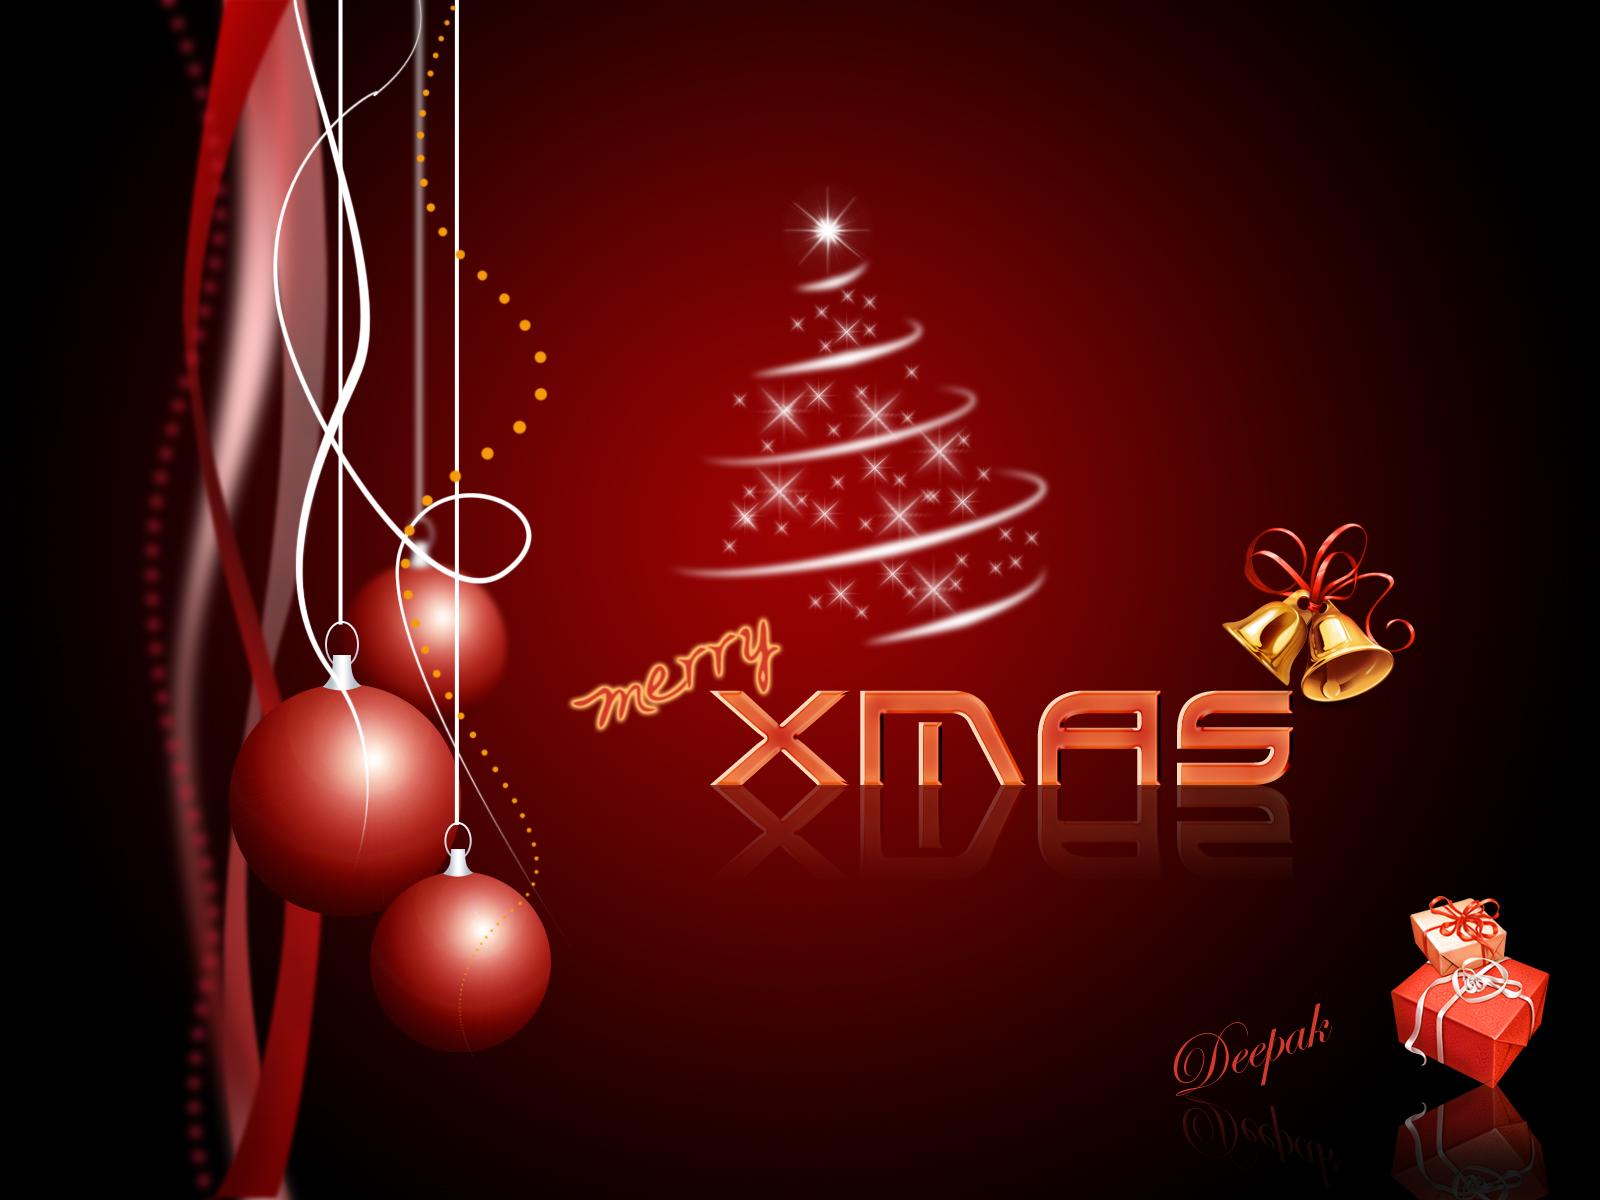 christmas cards 2012 holy - photo #3